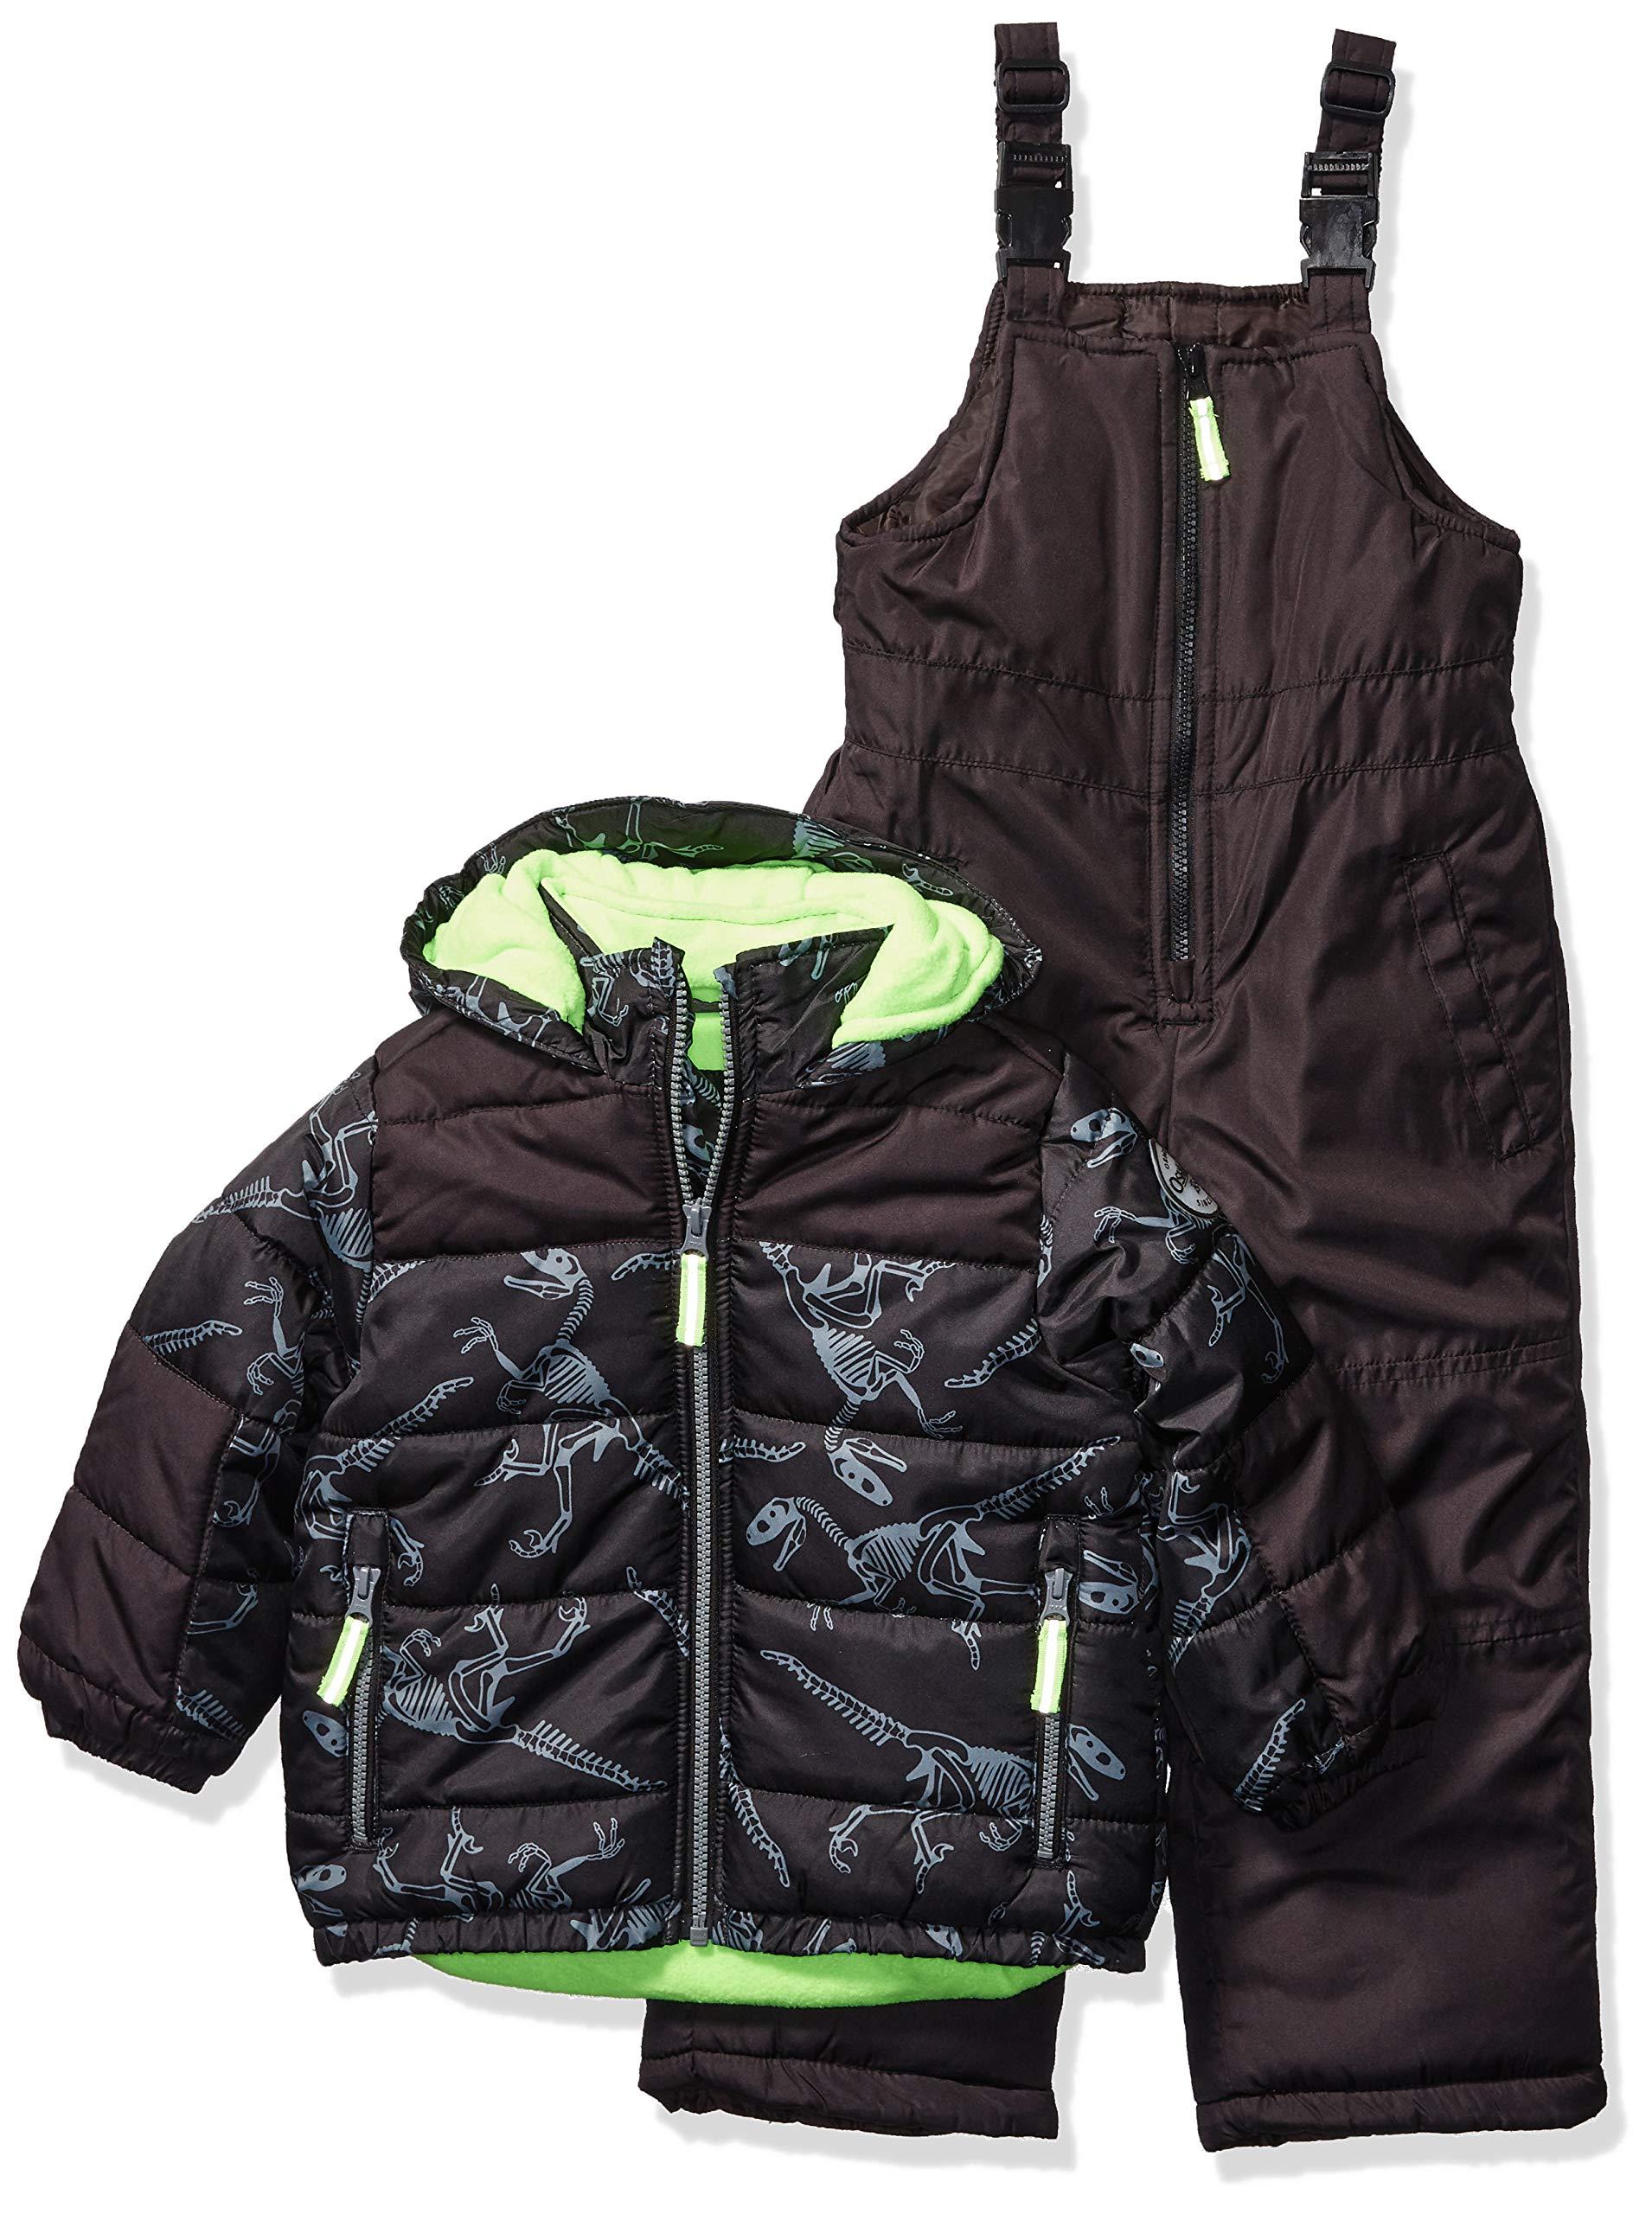 Osh Kosh Boys' Little Ski Jacket and Snowbib Snowsuit Set, Print Fall, 5/6 by OshKosh B'Gosh